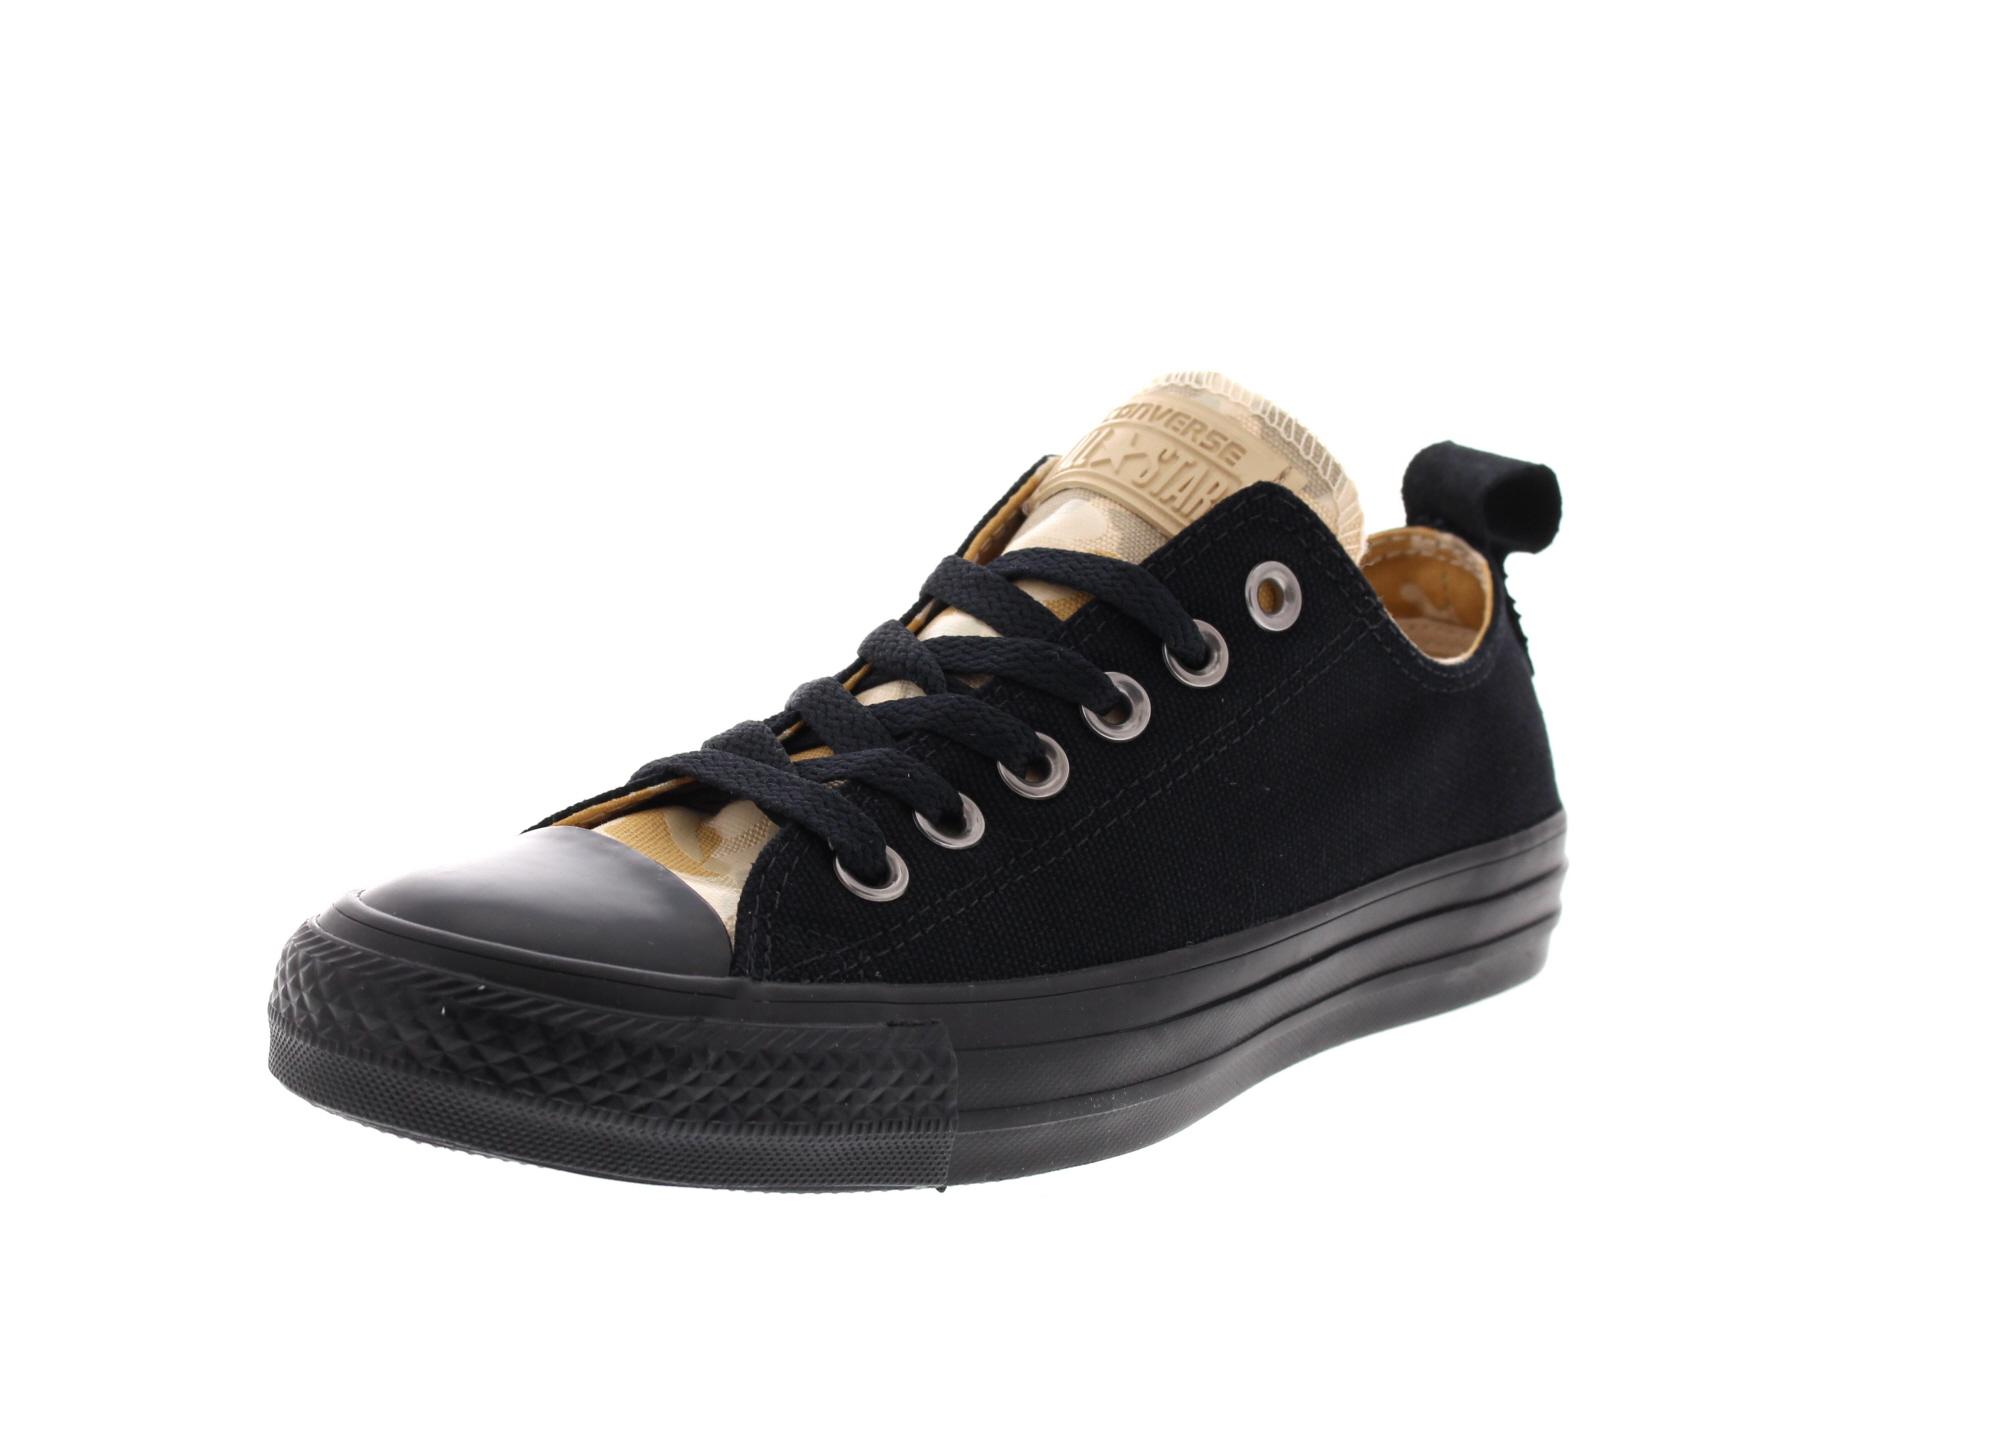 CONVERSE Sneakers - CTAS OX 159755C - black light twine_0